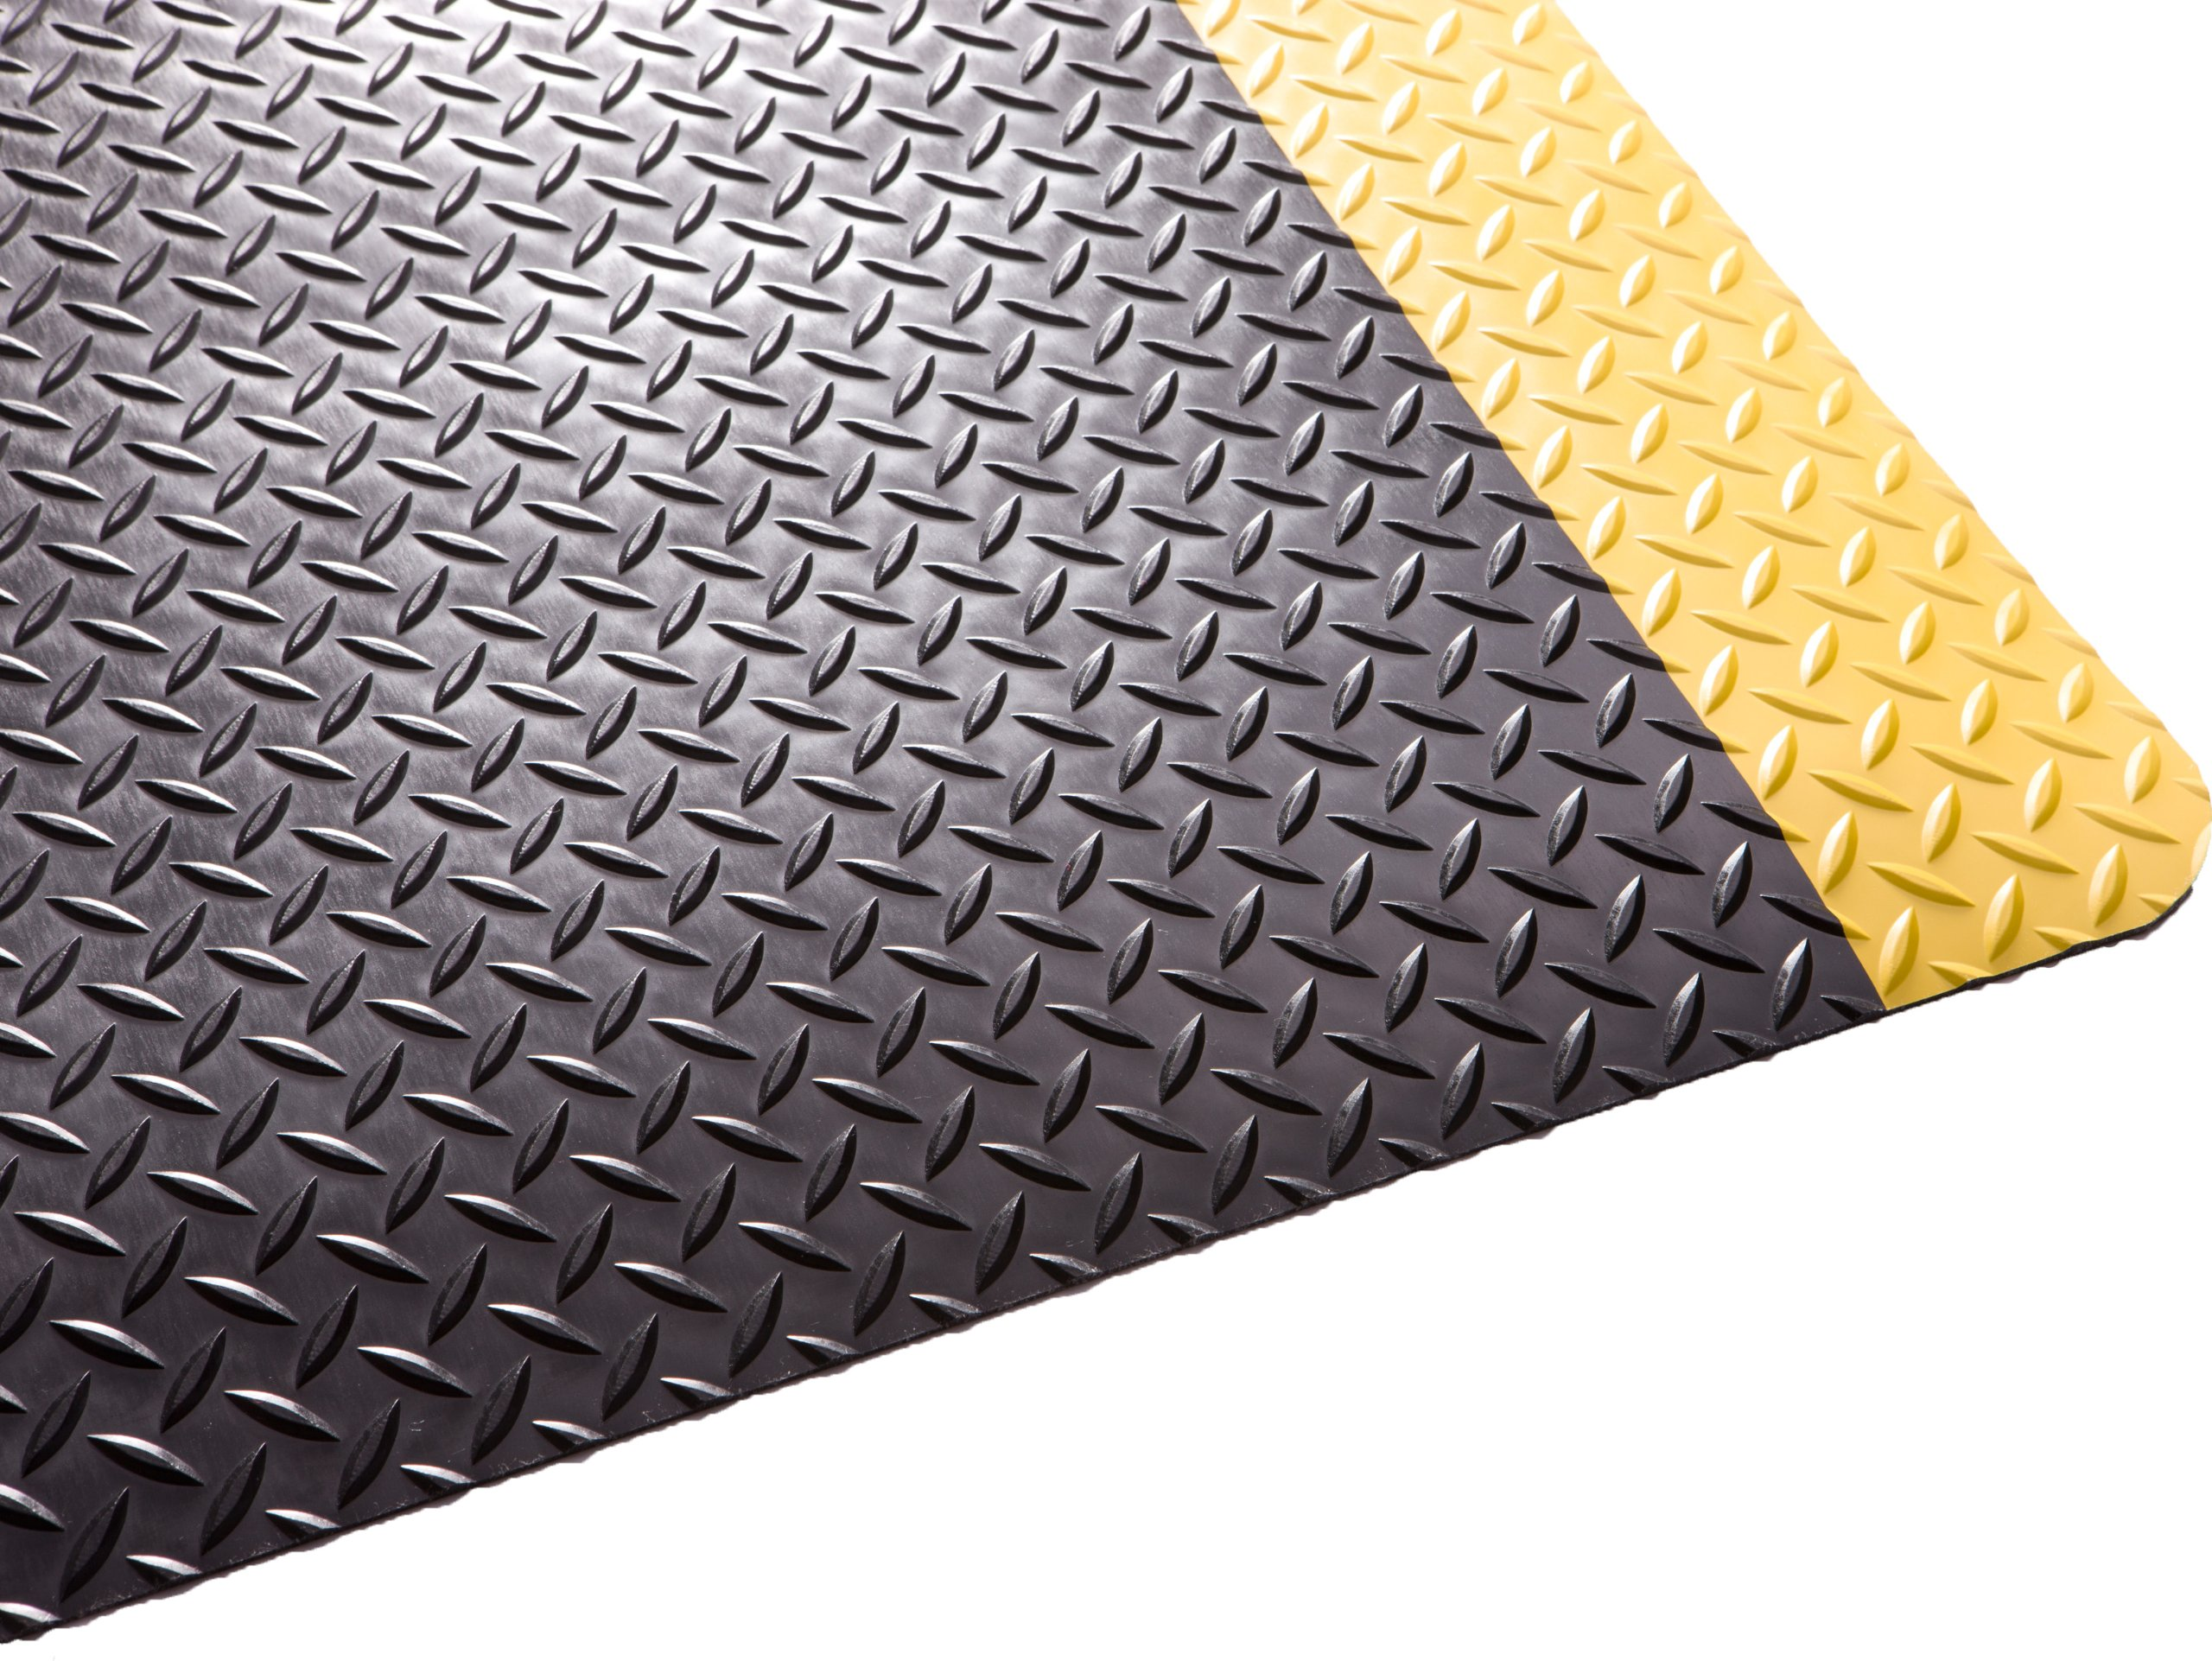 Guardian Safe Step Anti-Fatigue Floor Mat, Vinyl, 3'x5', Blk/Ylw by Guardian